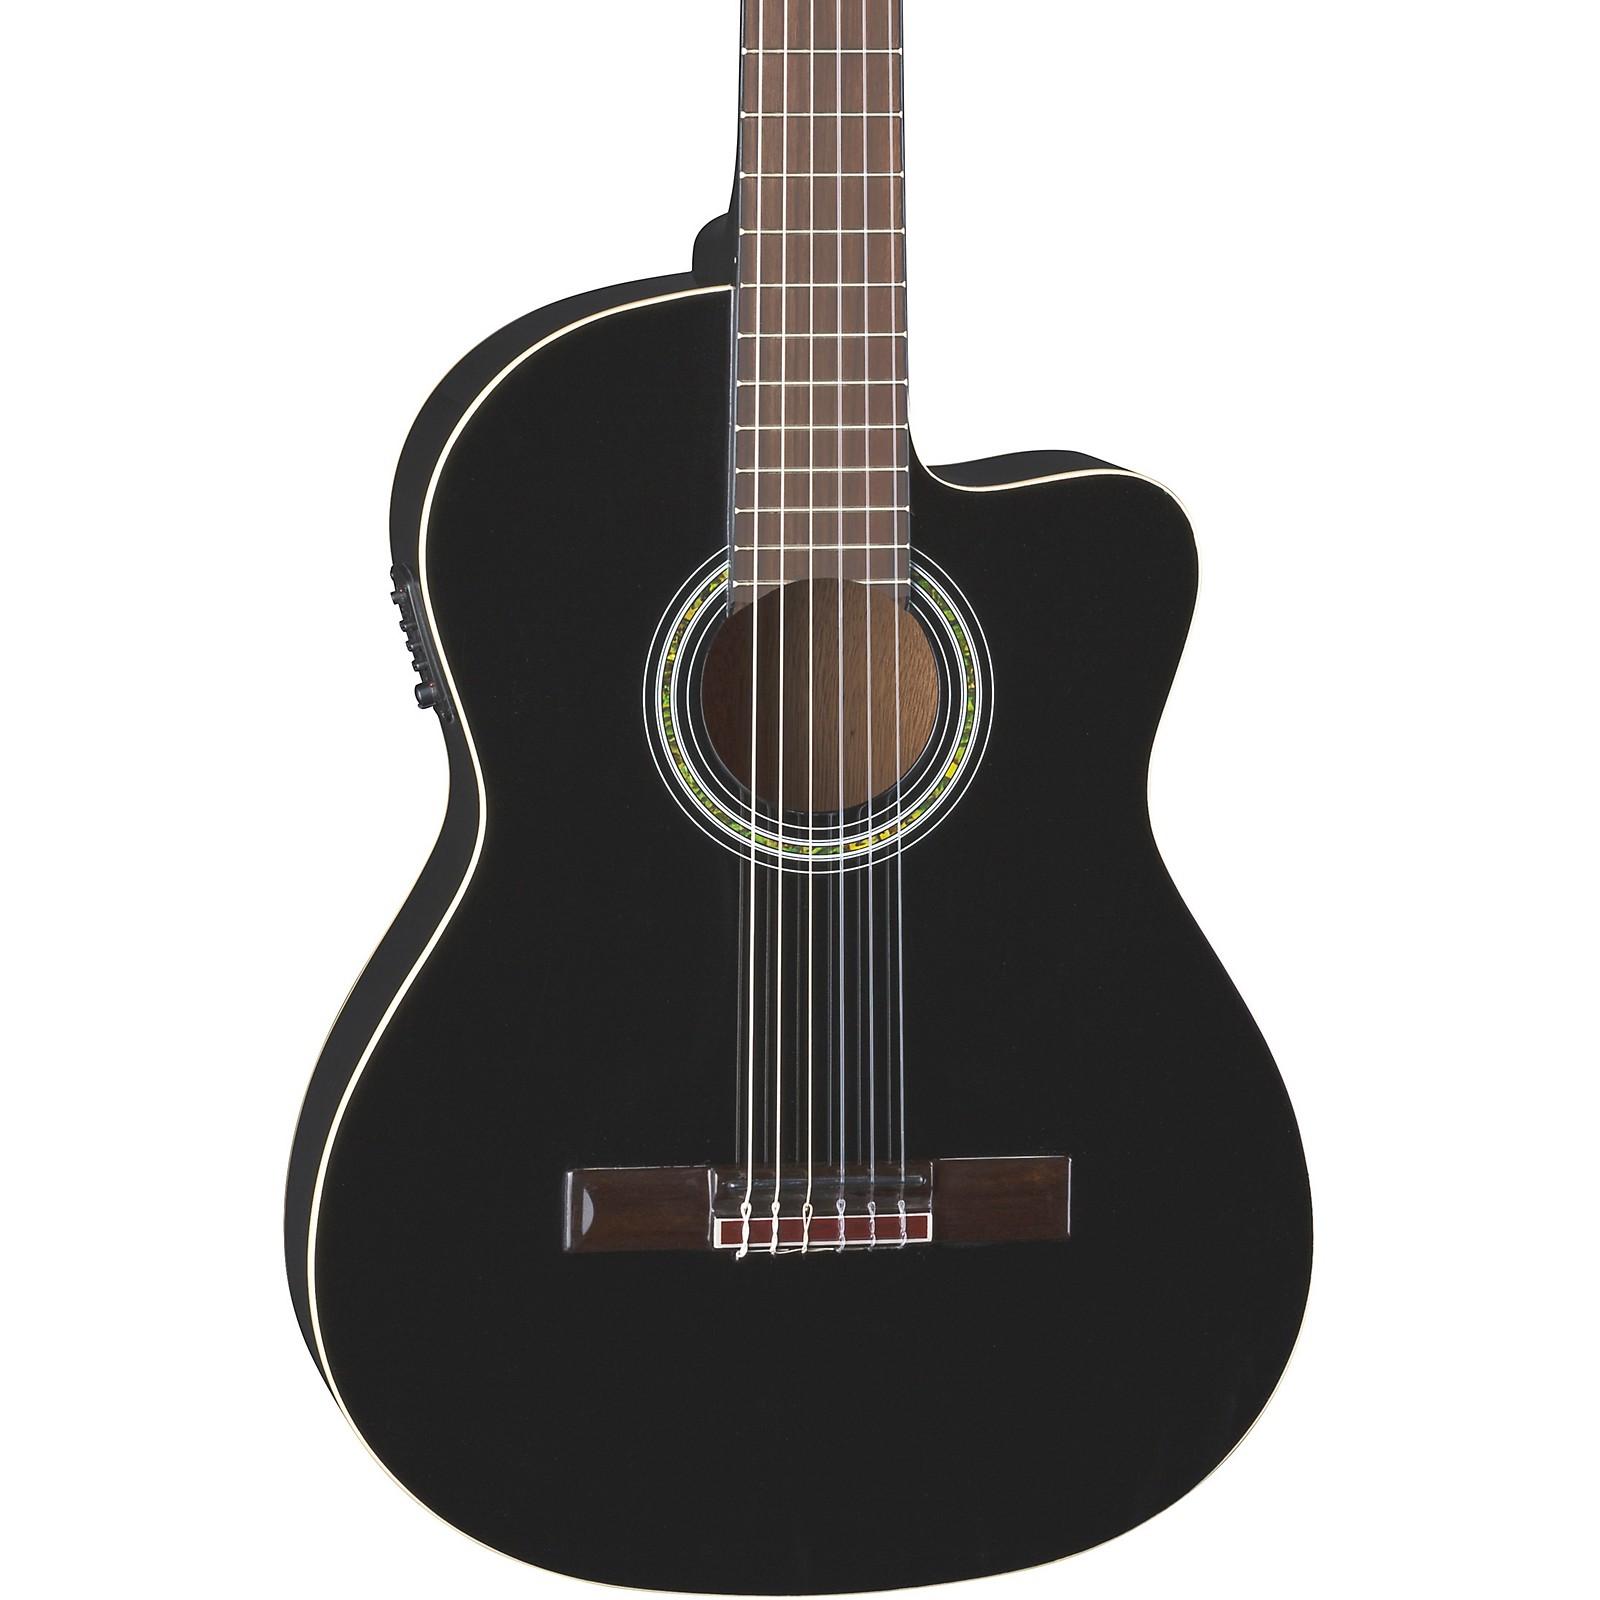 Dean Espana Full Size Acoustic-Electric Cutaway Classical Guitar